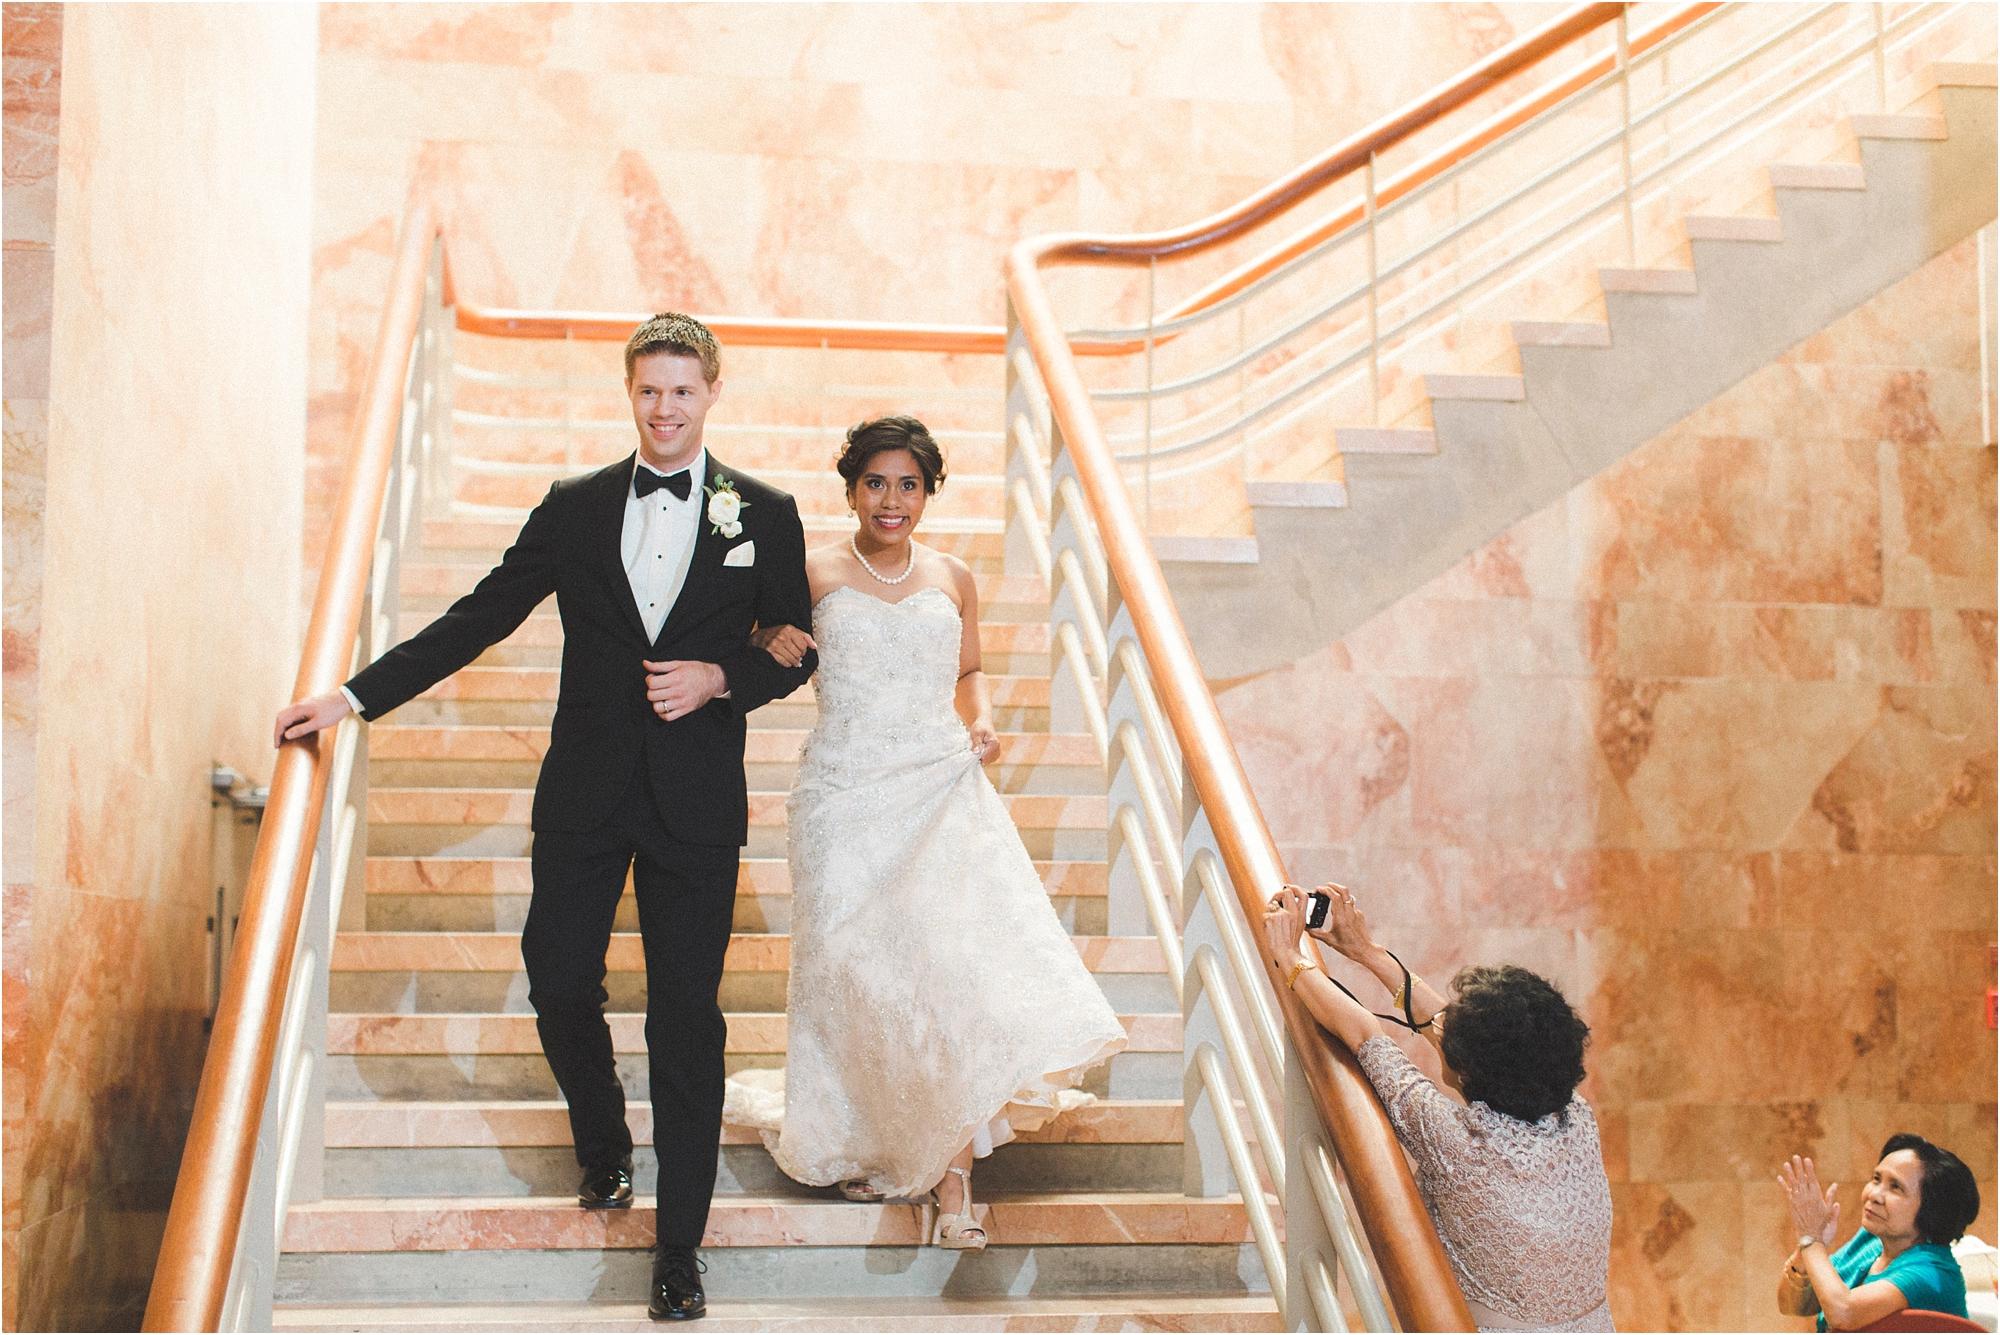 stephanie-yonce-photography-historic-church-virginia-museu-fine-arts-wedding-photos_066.JPG